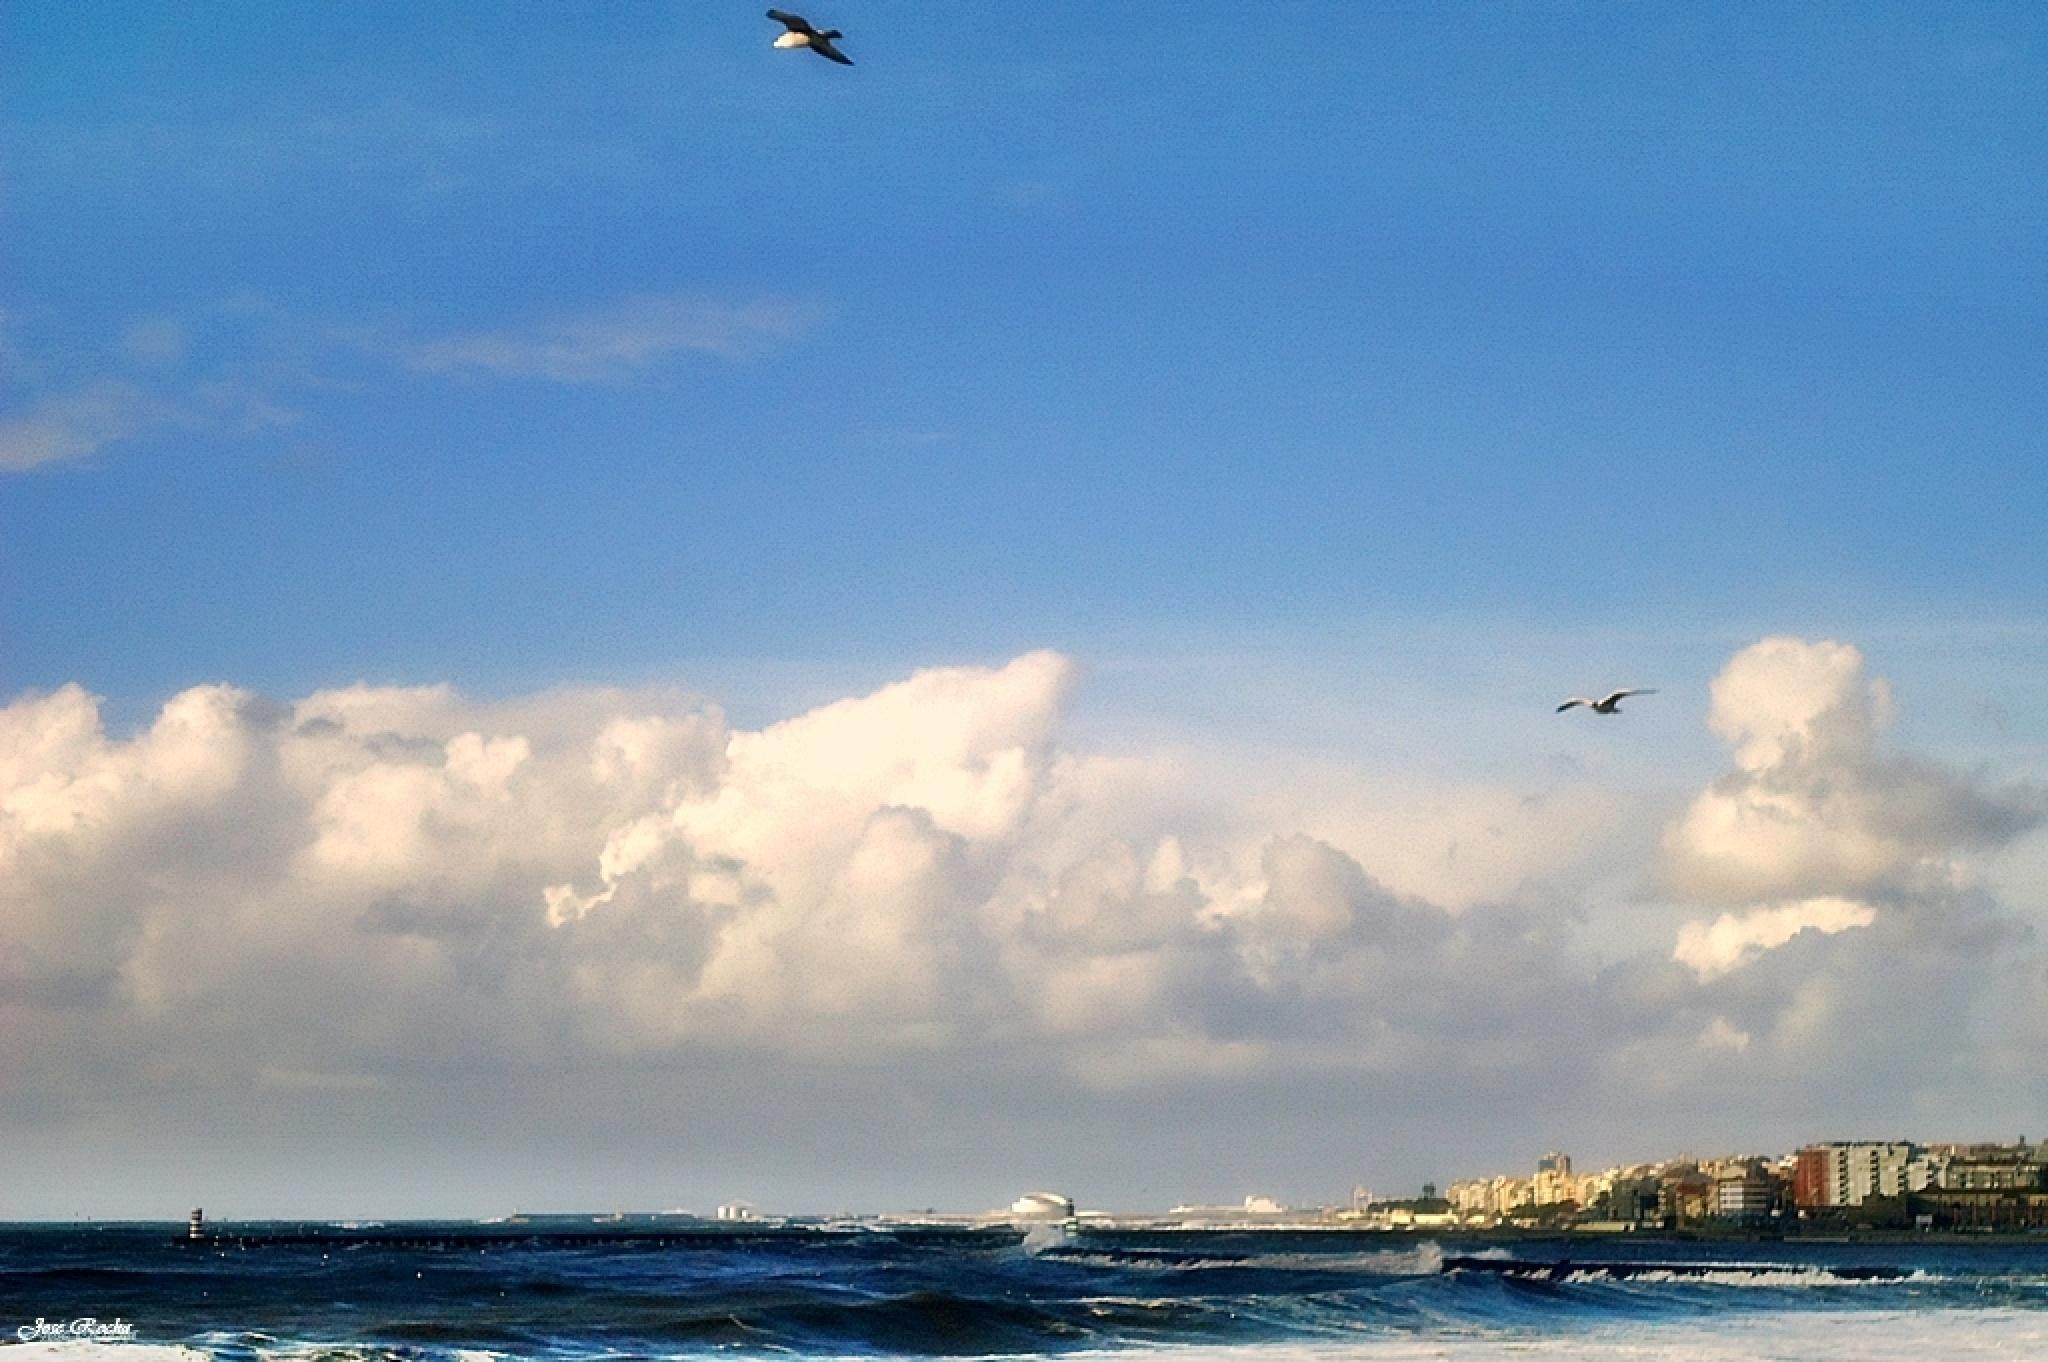 seagull flies away, flies so high ... by josé rocha photography